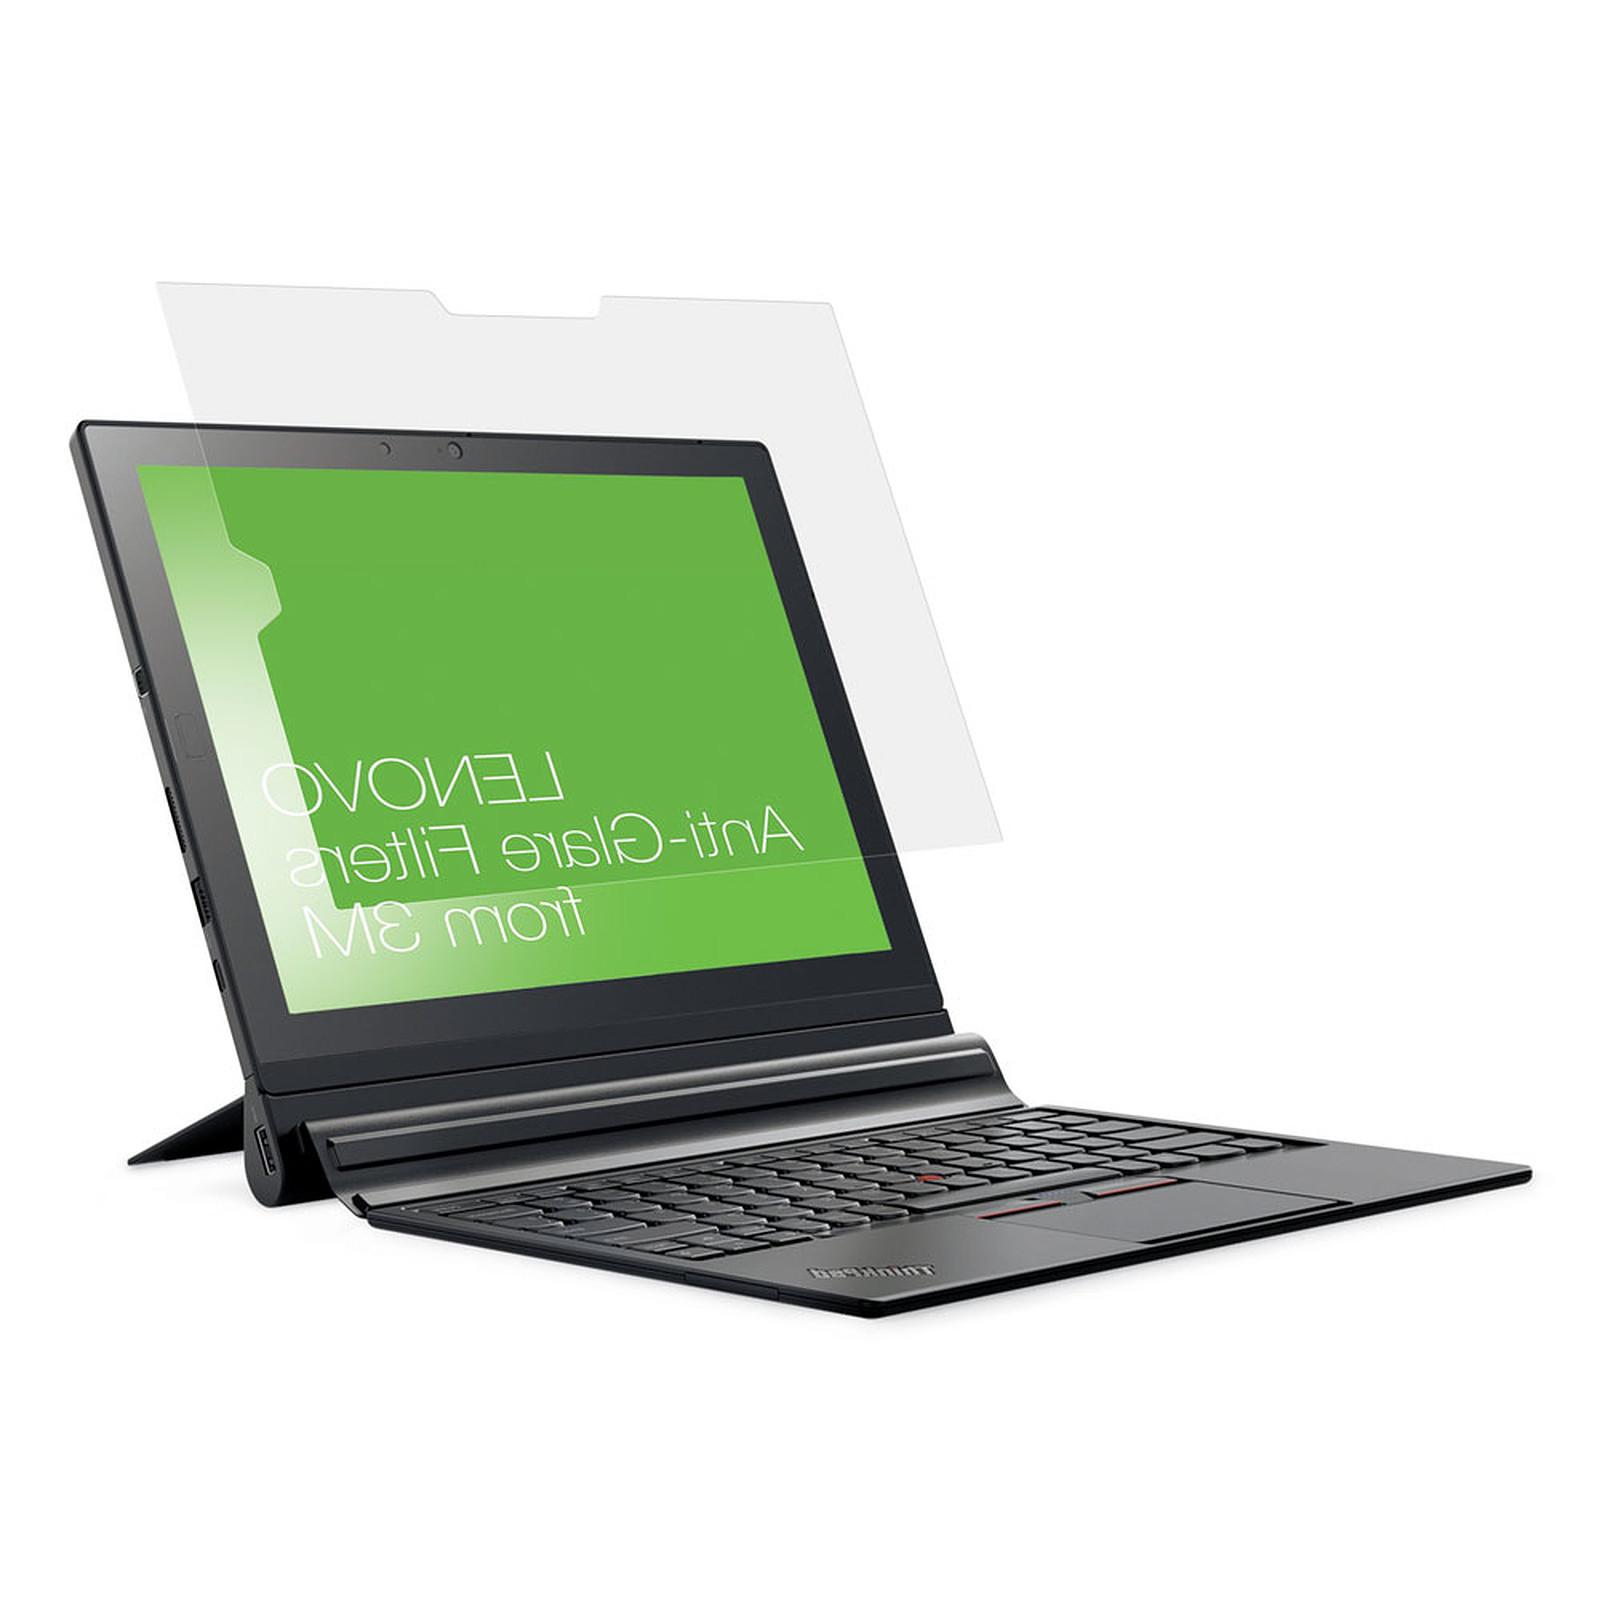 Accesorios Portatil 9fdy Lenovo Anti Glare Filter for X1 Tablet From 3m Accesorios Portà Til